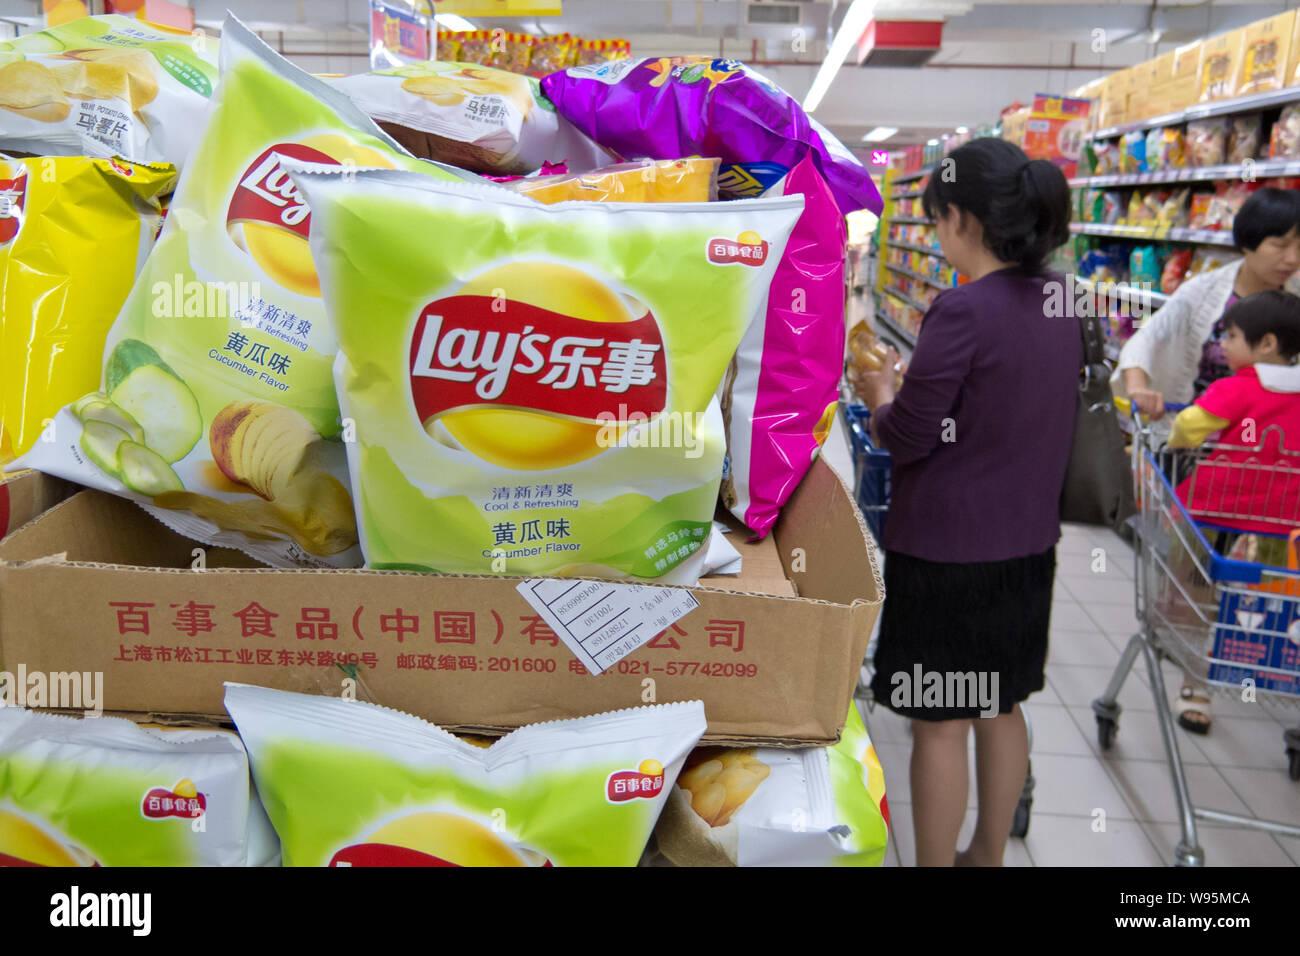 lays potato chips stock